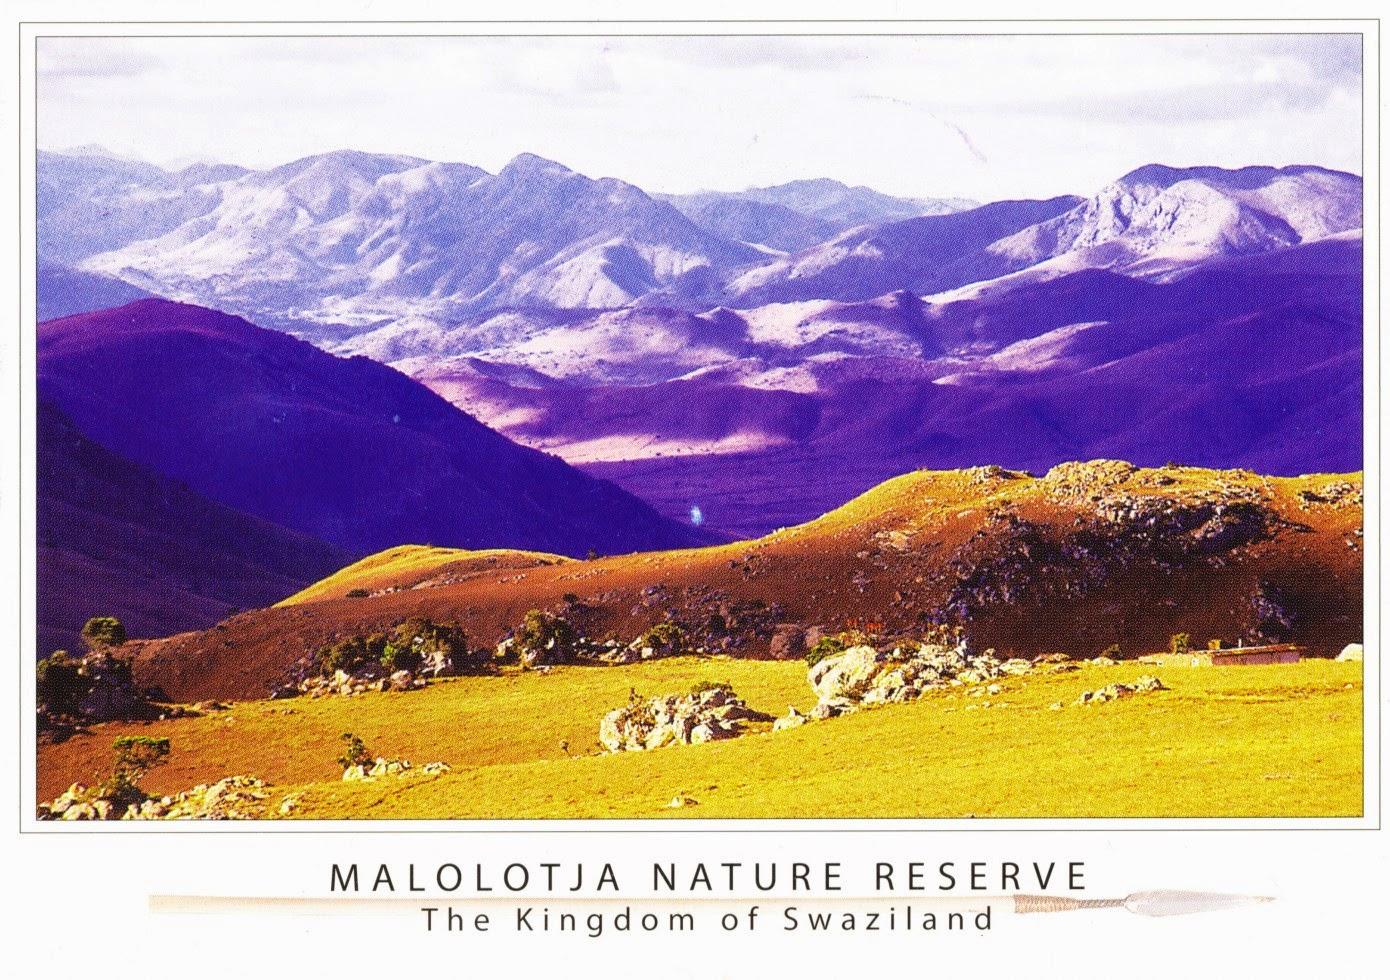 swaziland, postcard, nature, mountains